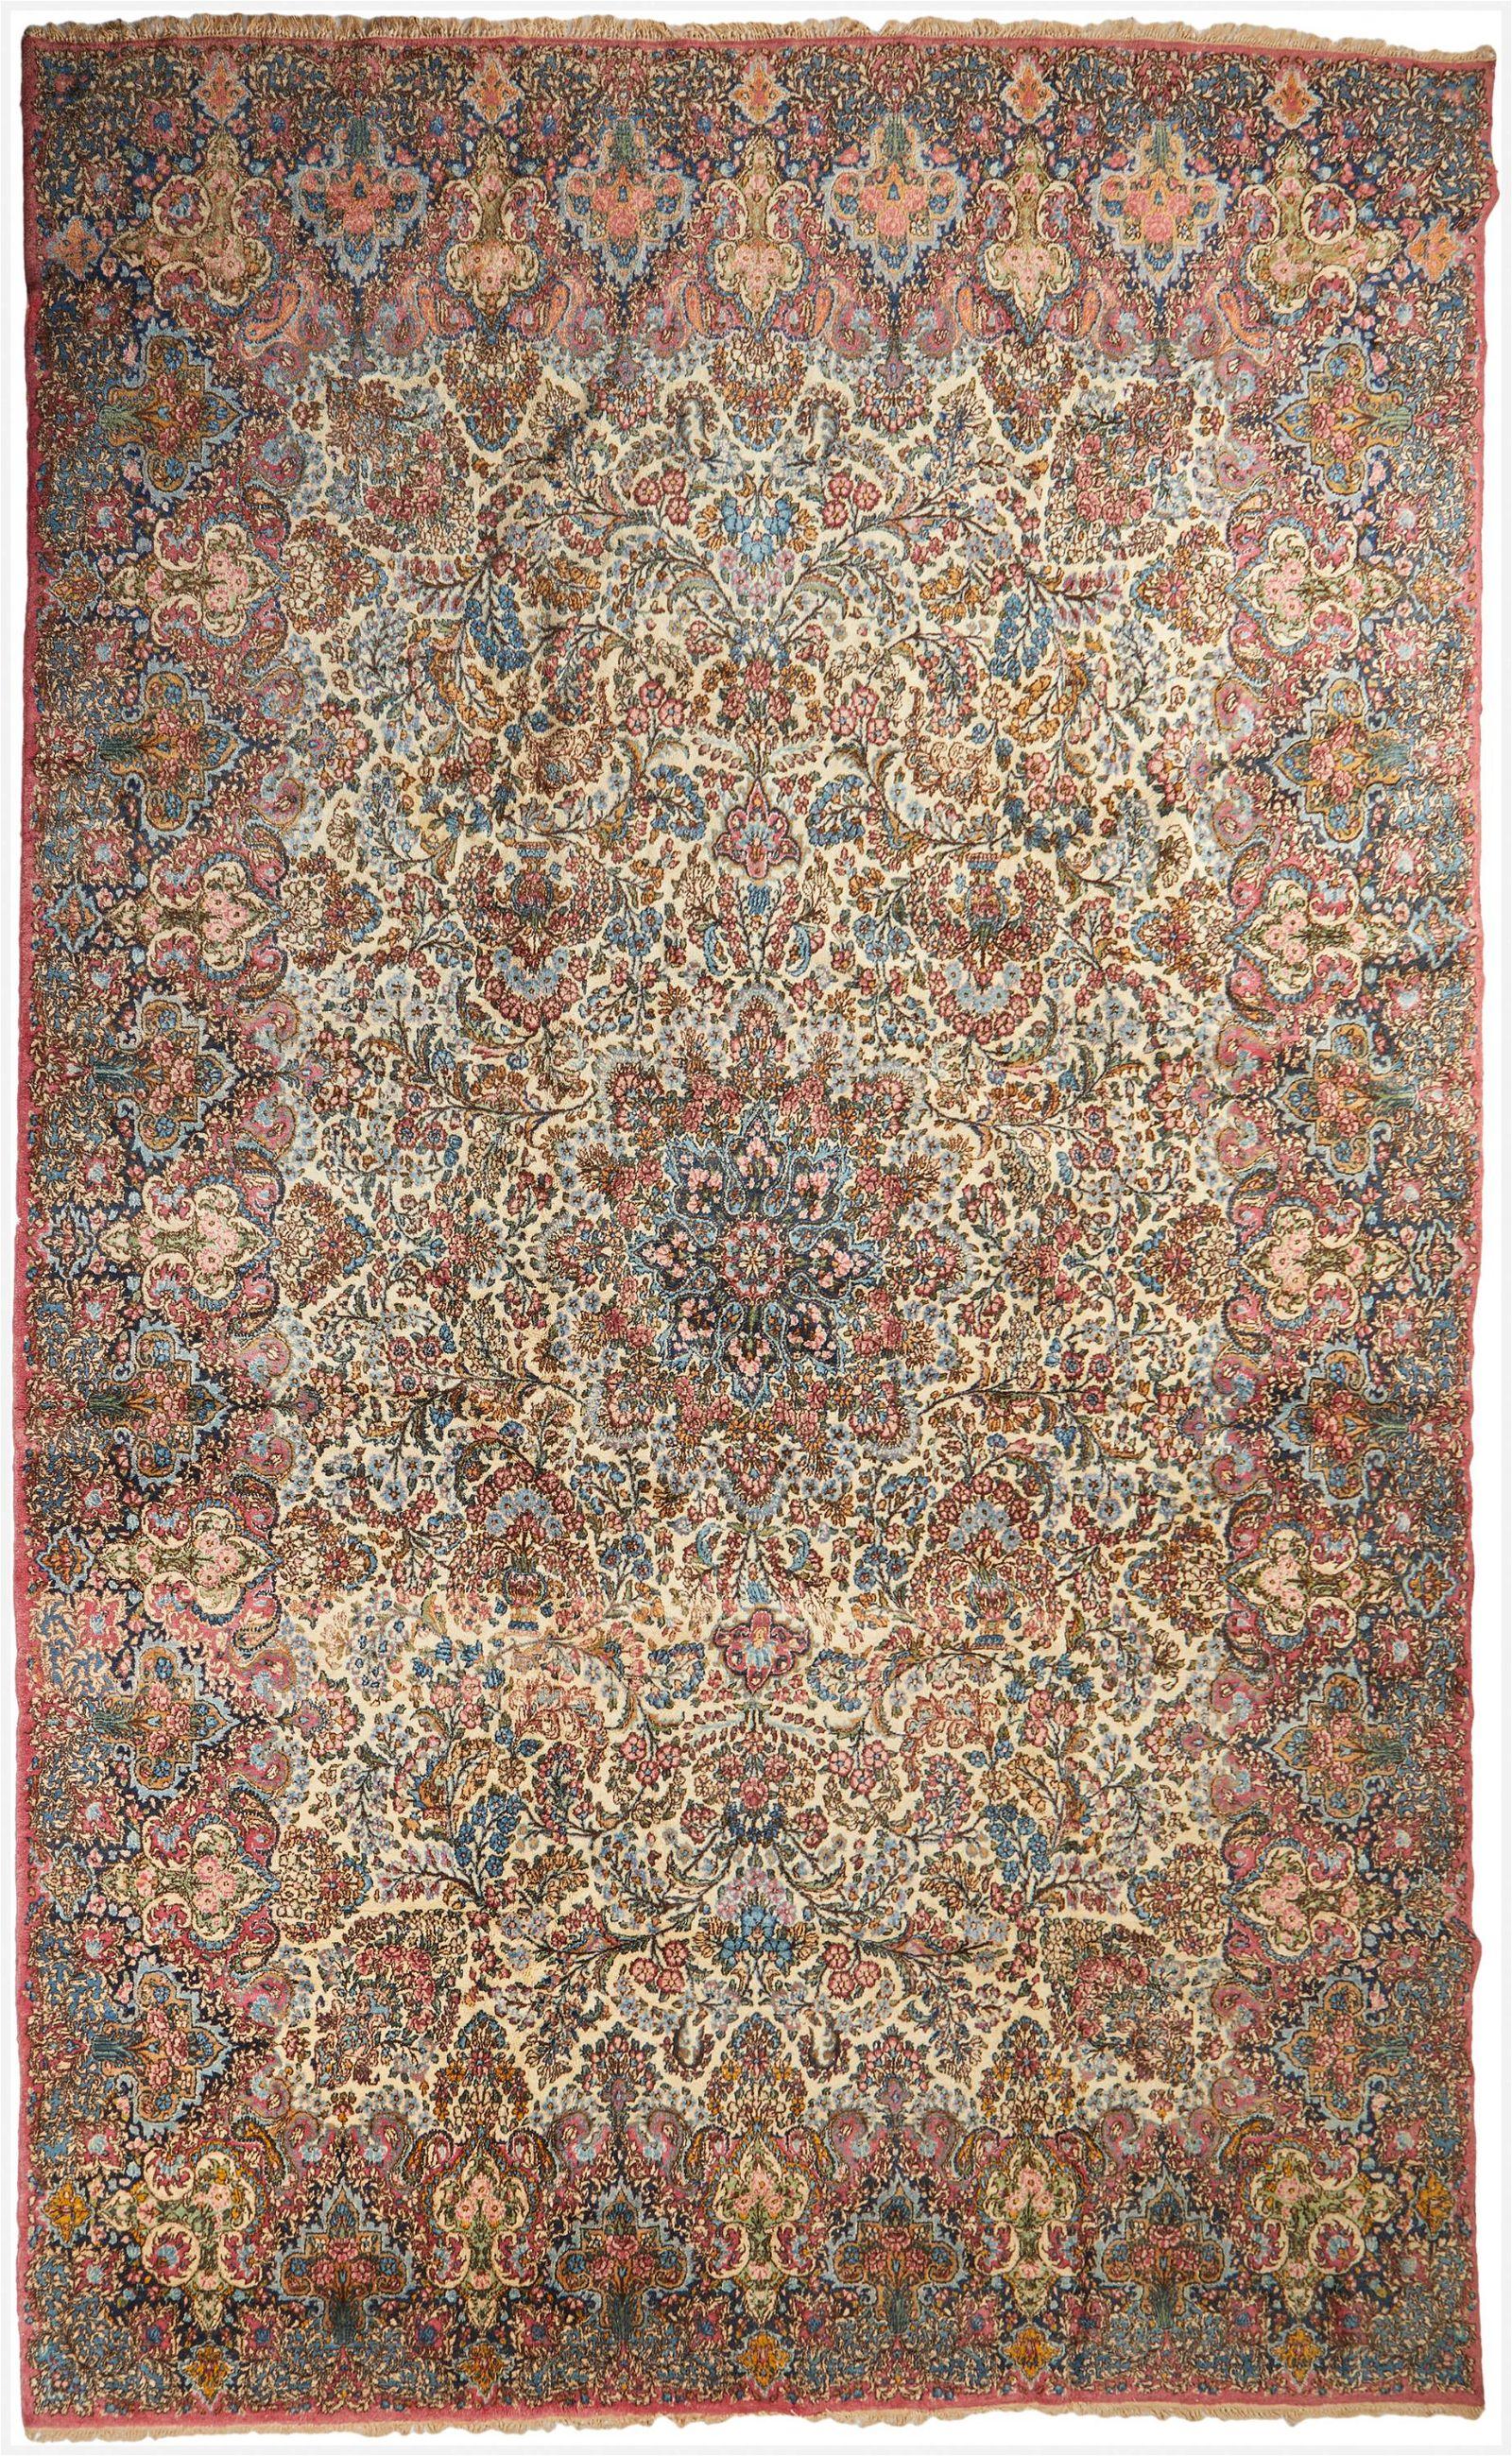 A Persian Kerman room-sized rug